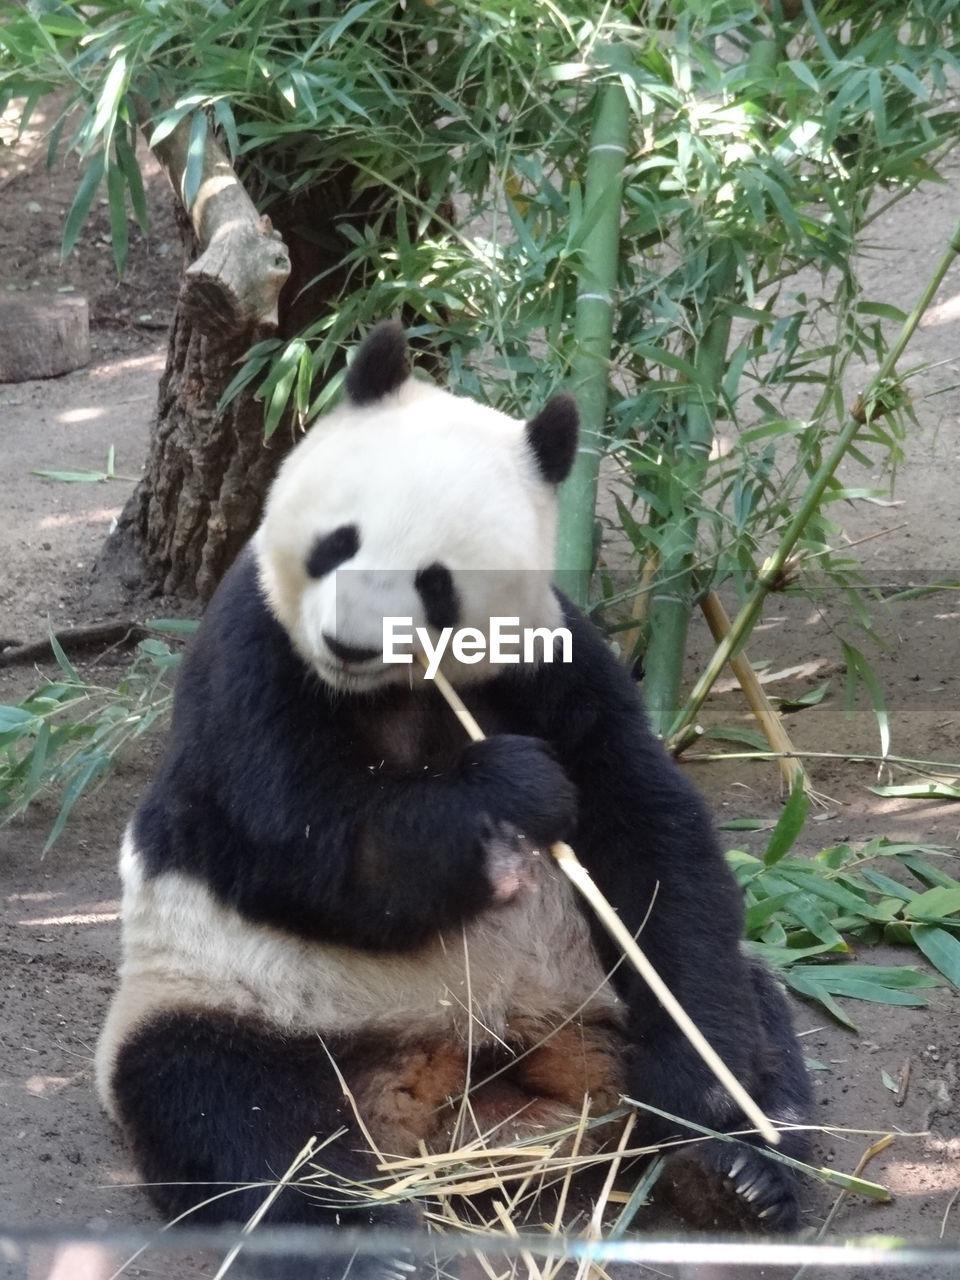 animal themes, mammal, animal, animal wildlife, animals in the wild, one animal, panda - animal, vertebrate, plant, nature, bear, day, sitting, endangered species, giant panda, zoology, eating, no people, outdoors, zoo, bamboo - plant, herbivorous